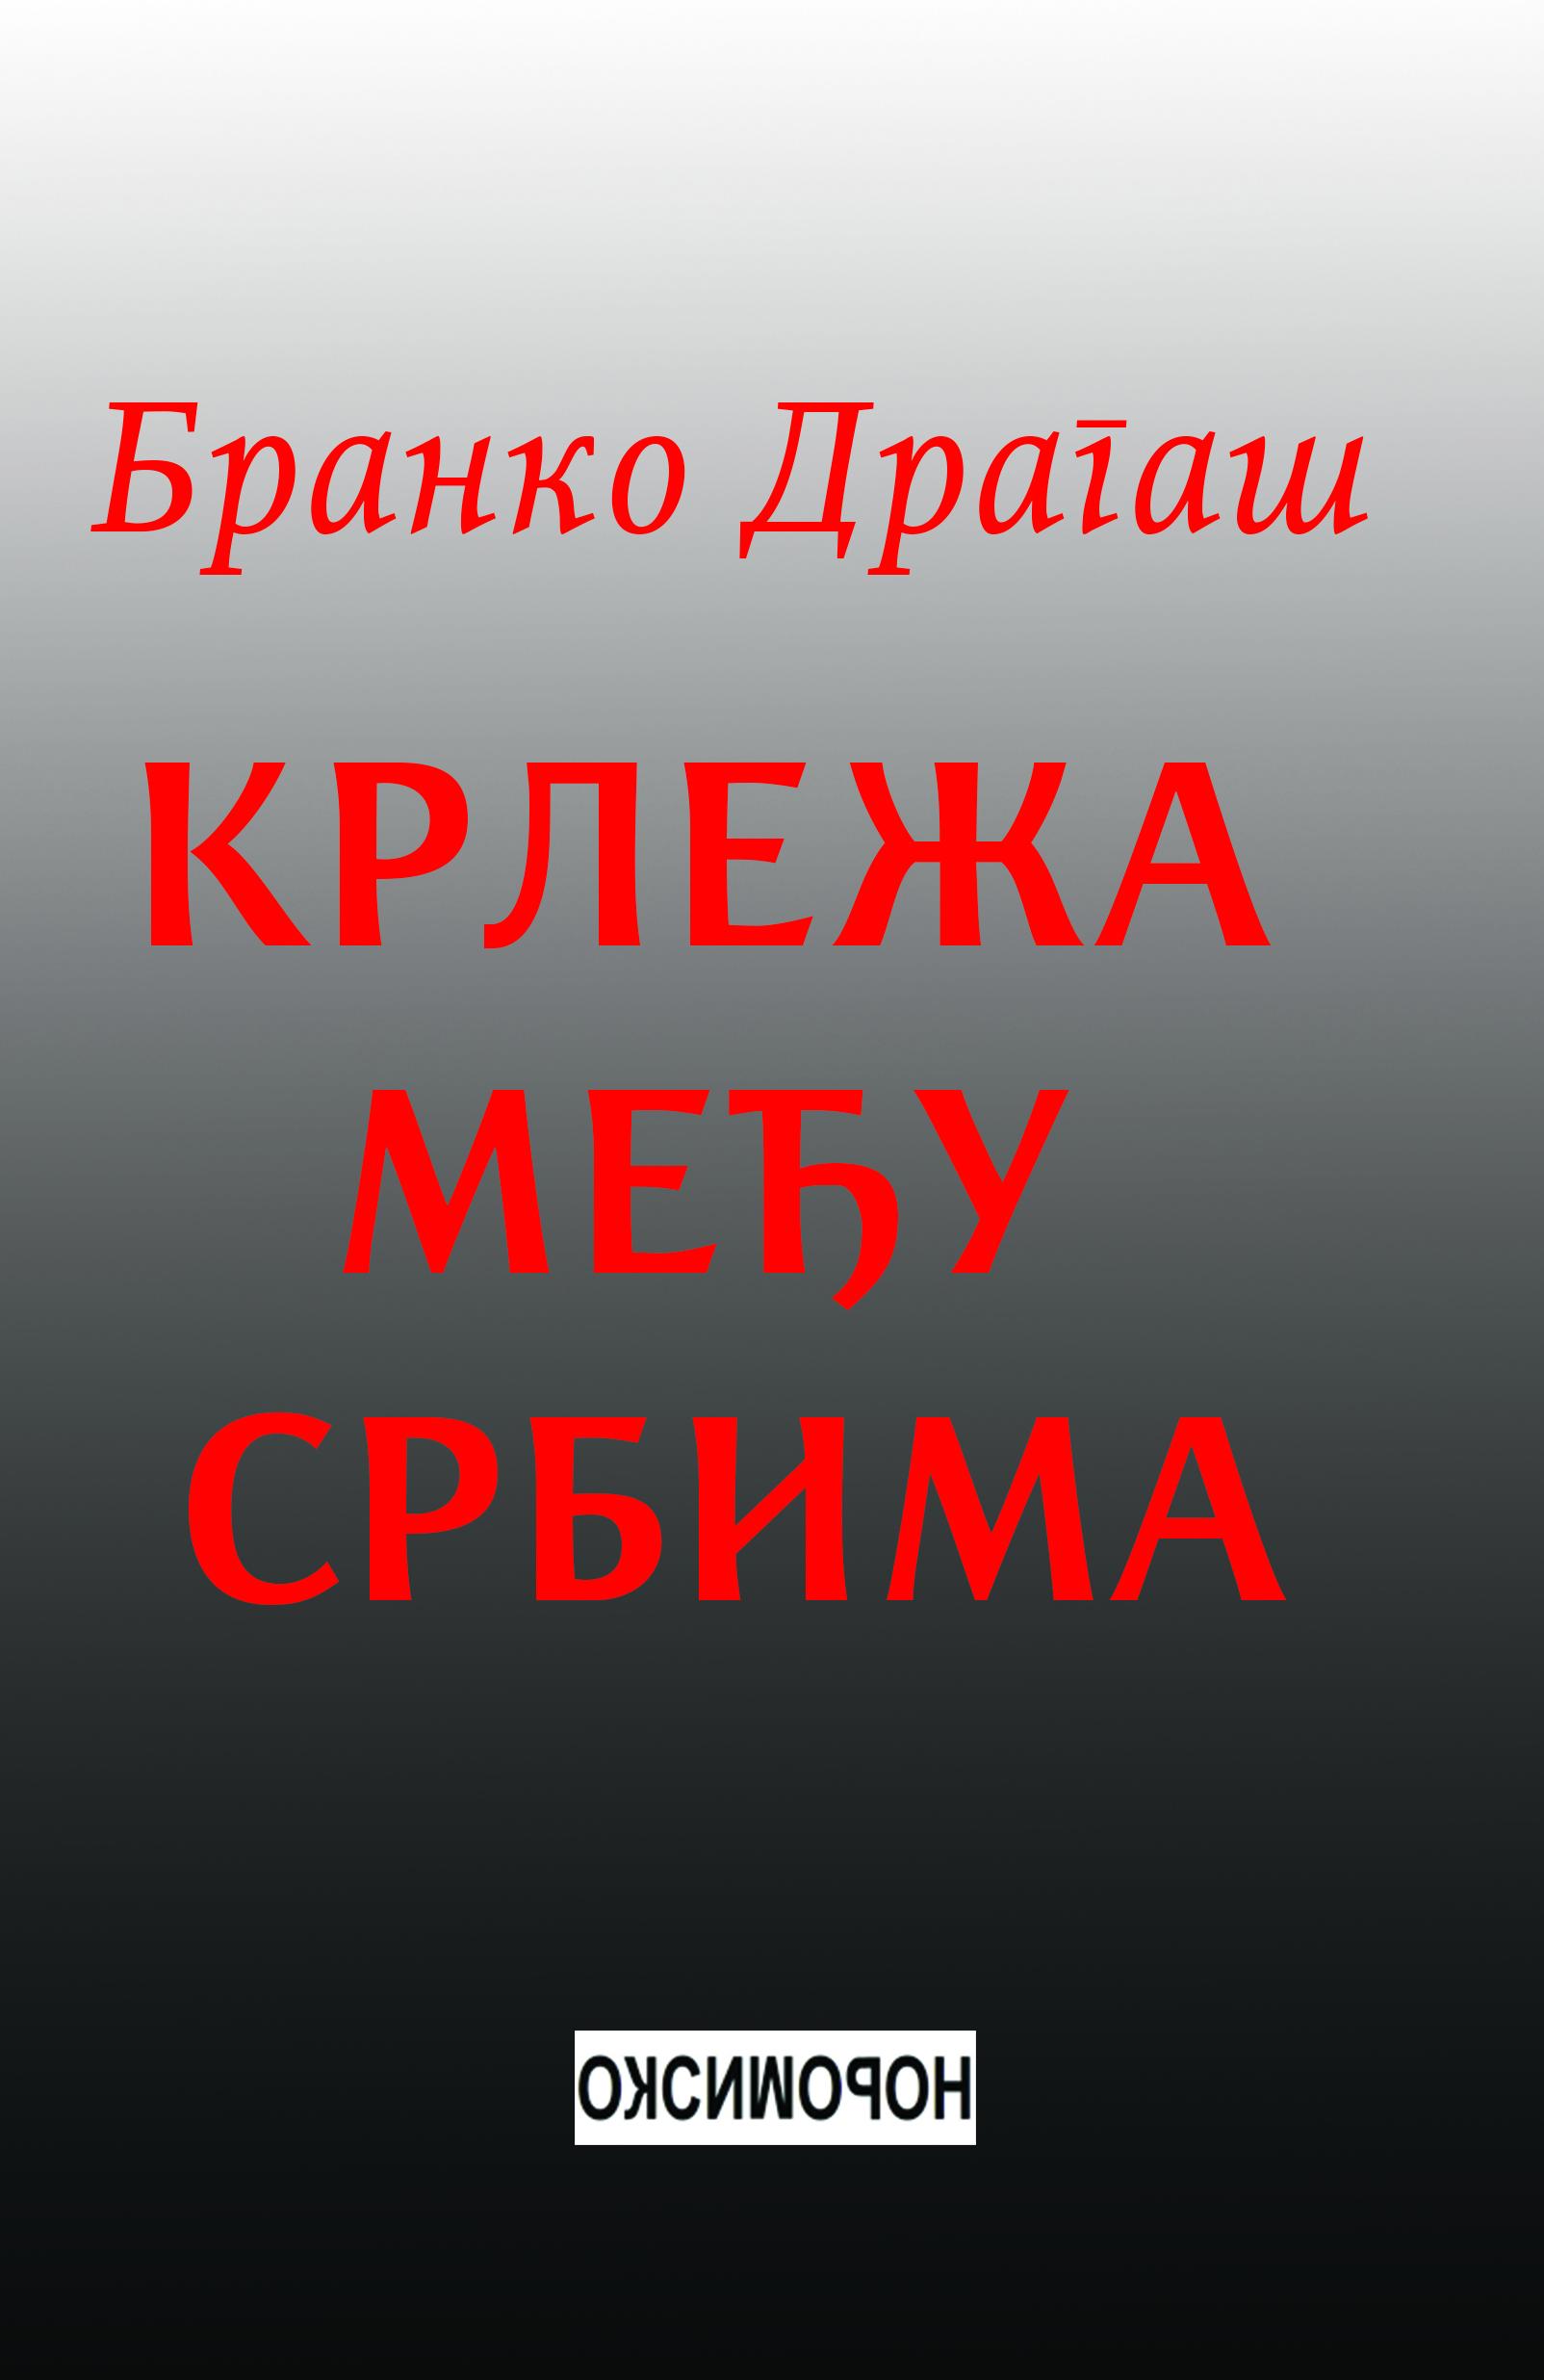 KrlezaK1